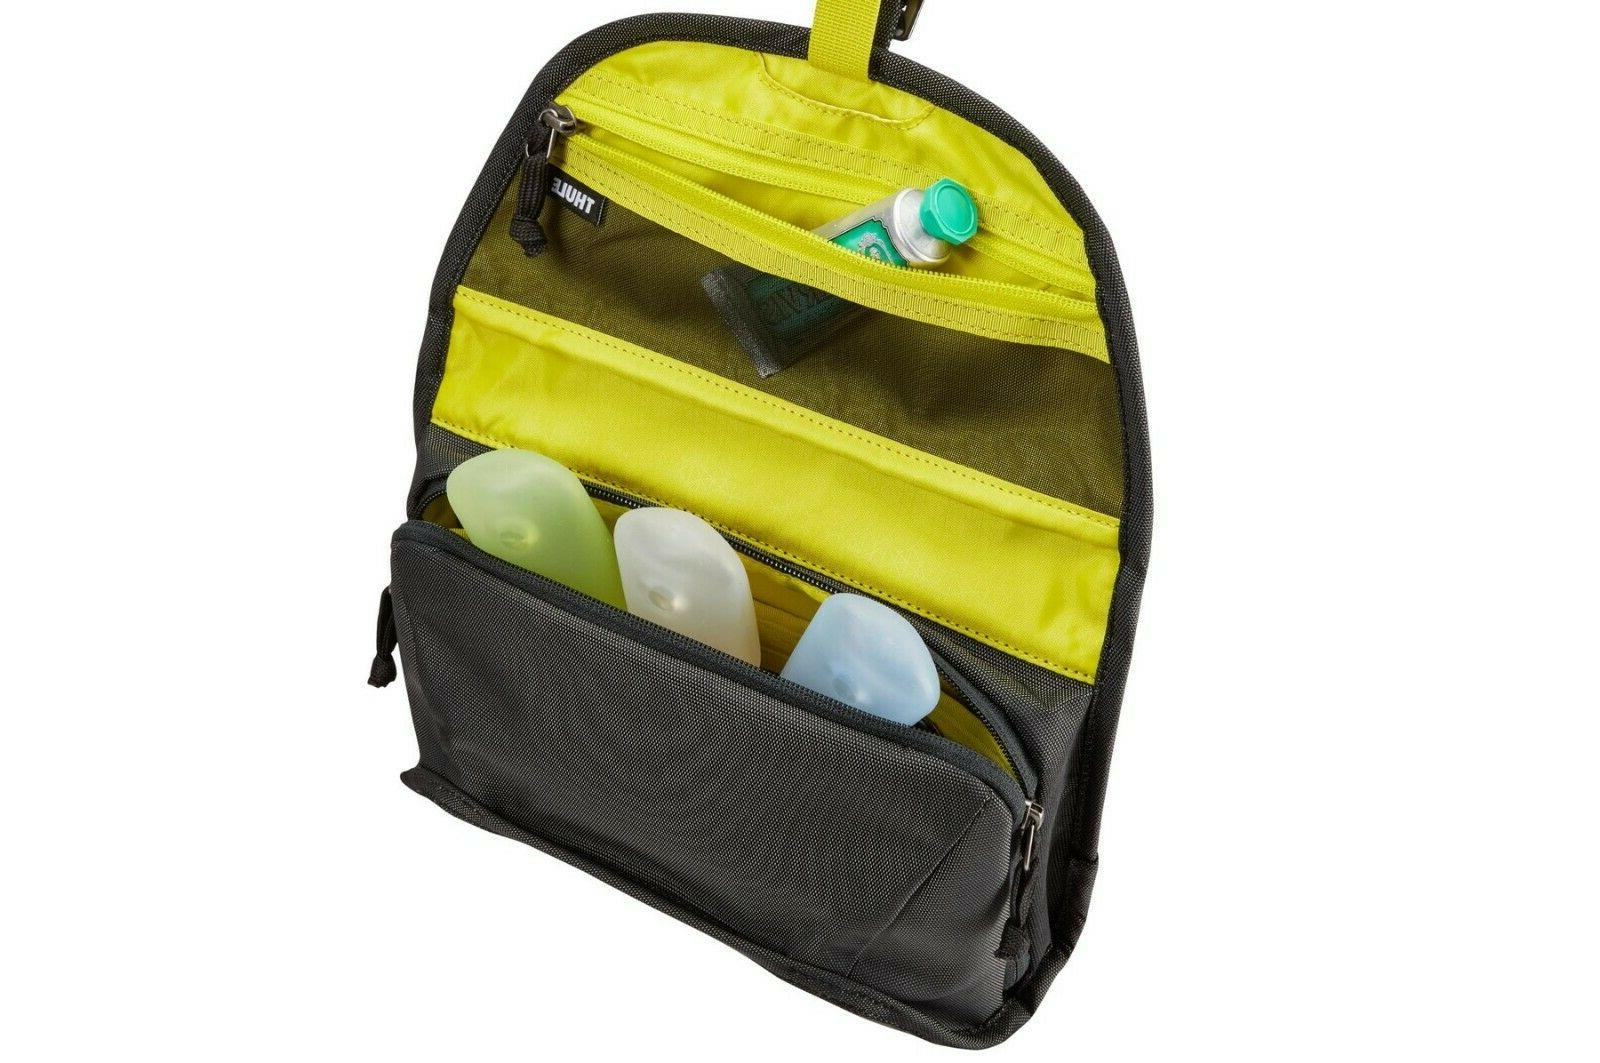 New, Black Thule 2 Backpack 20L Bundle